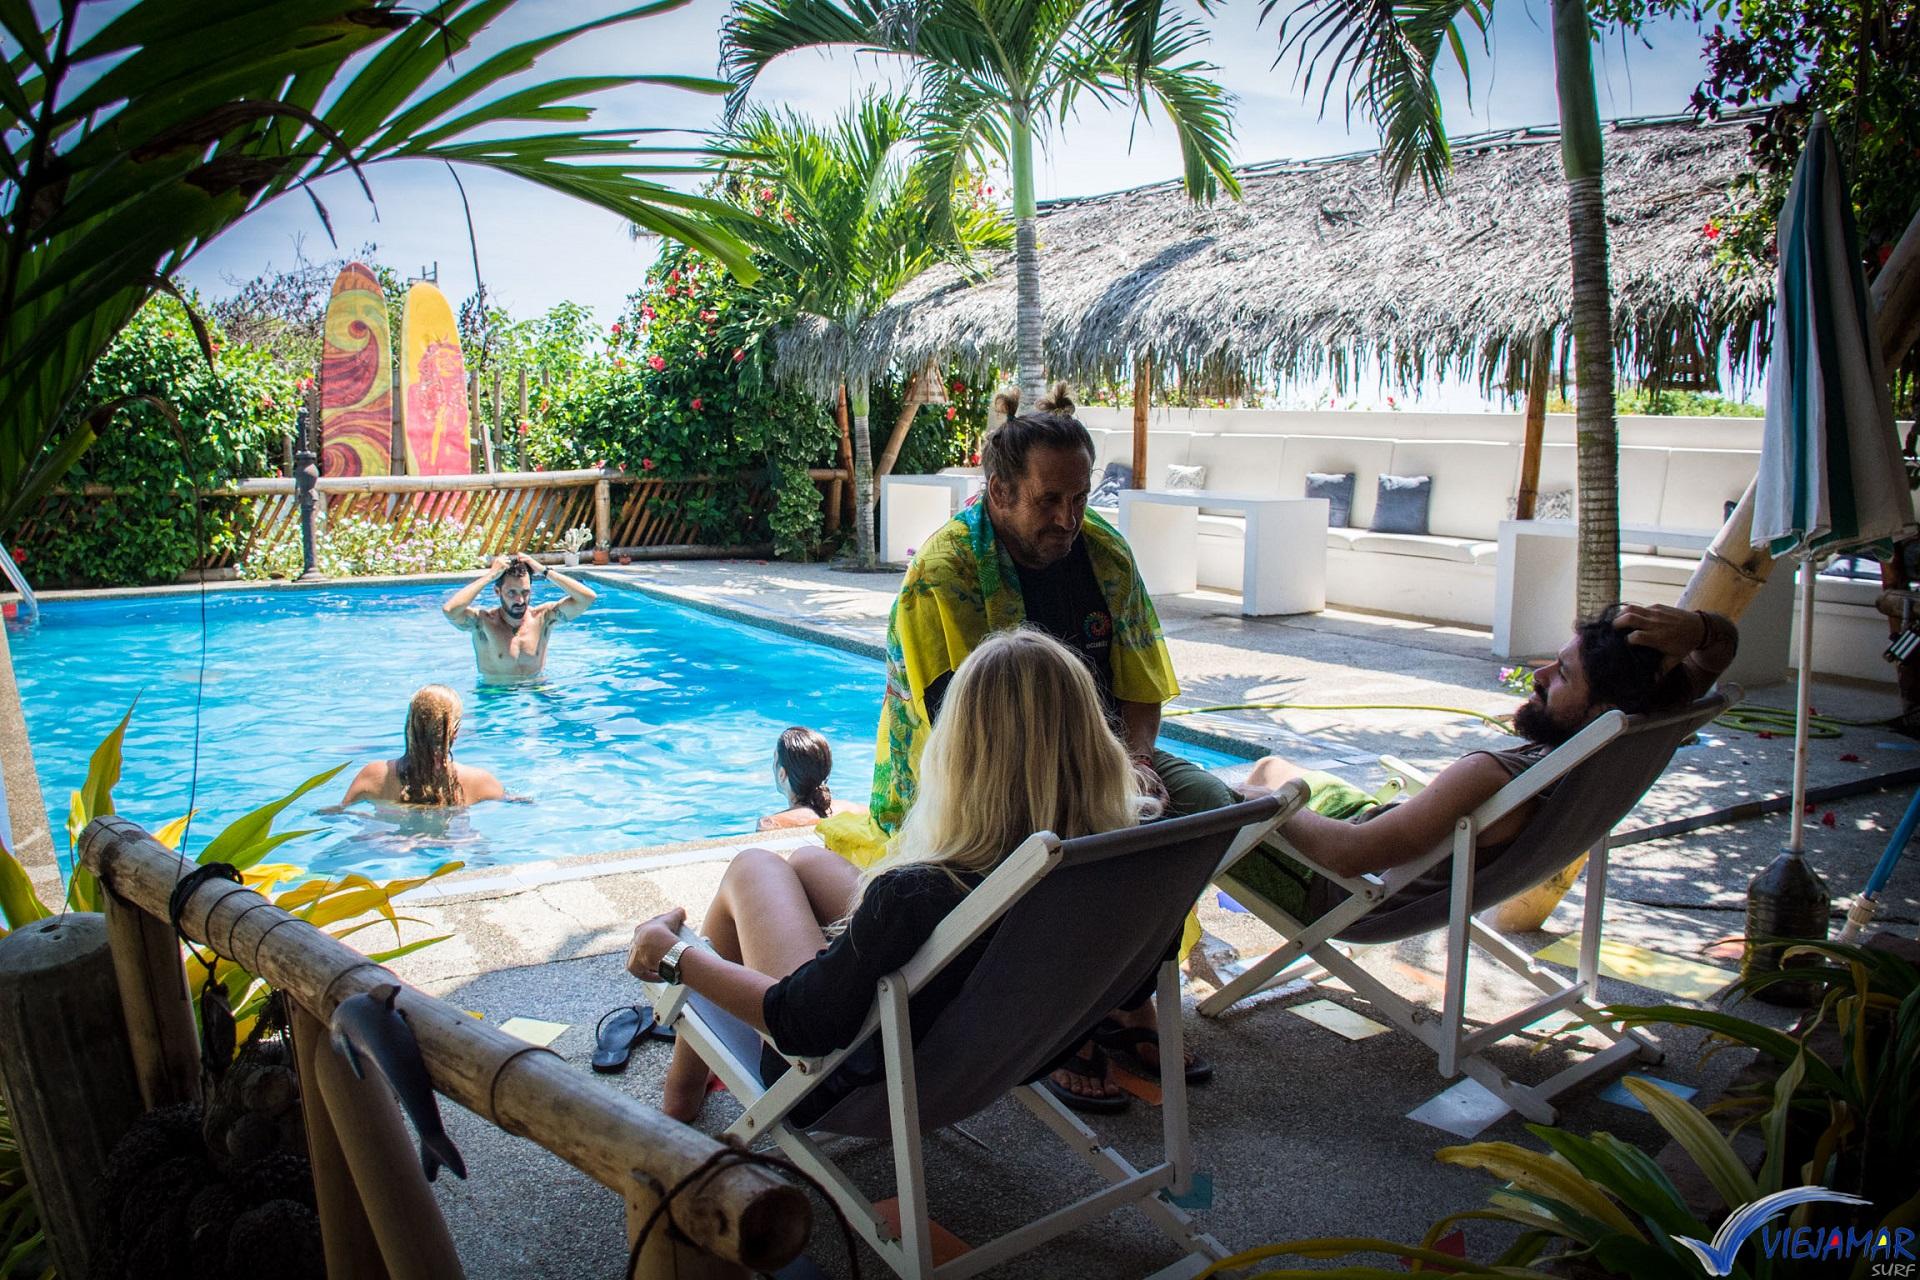 Viejamar Surf Hostel